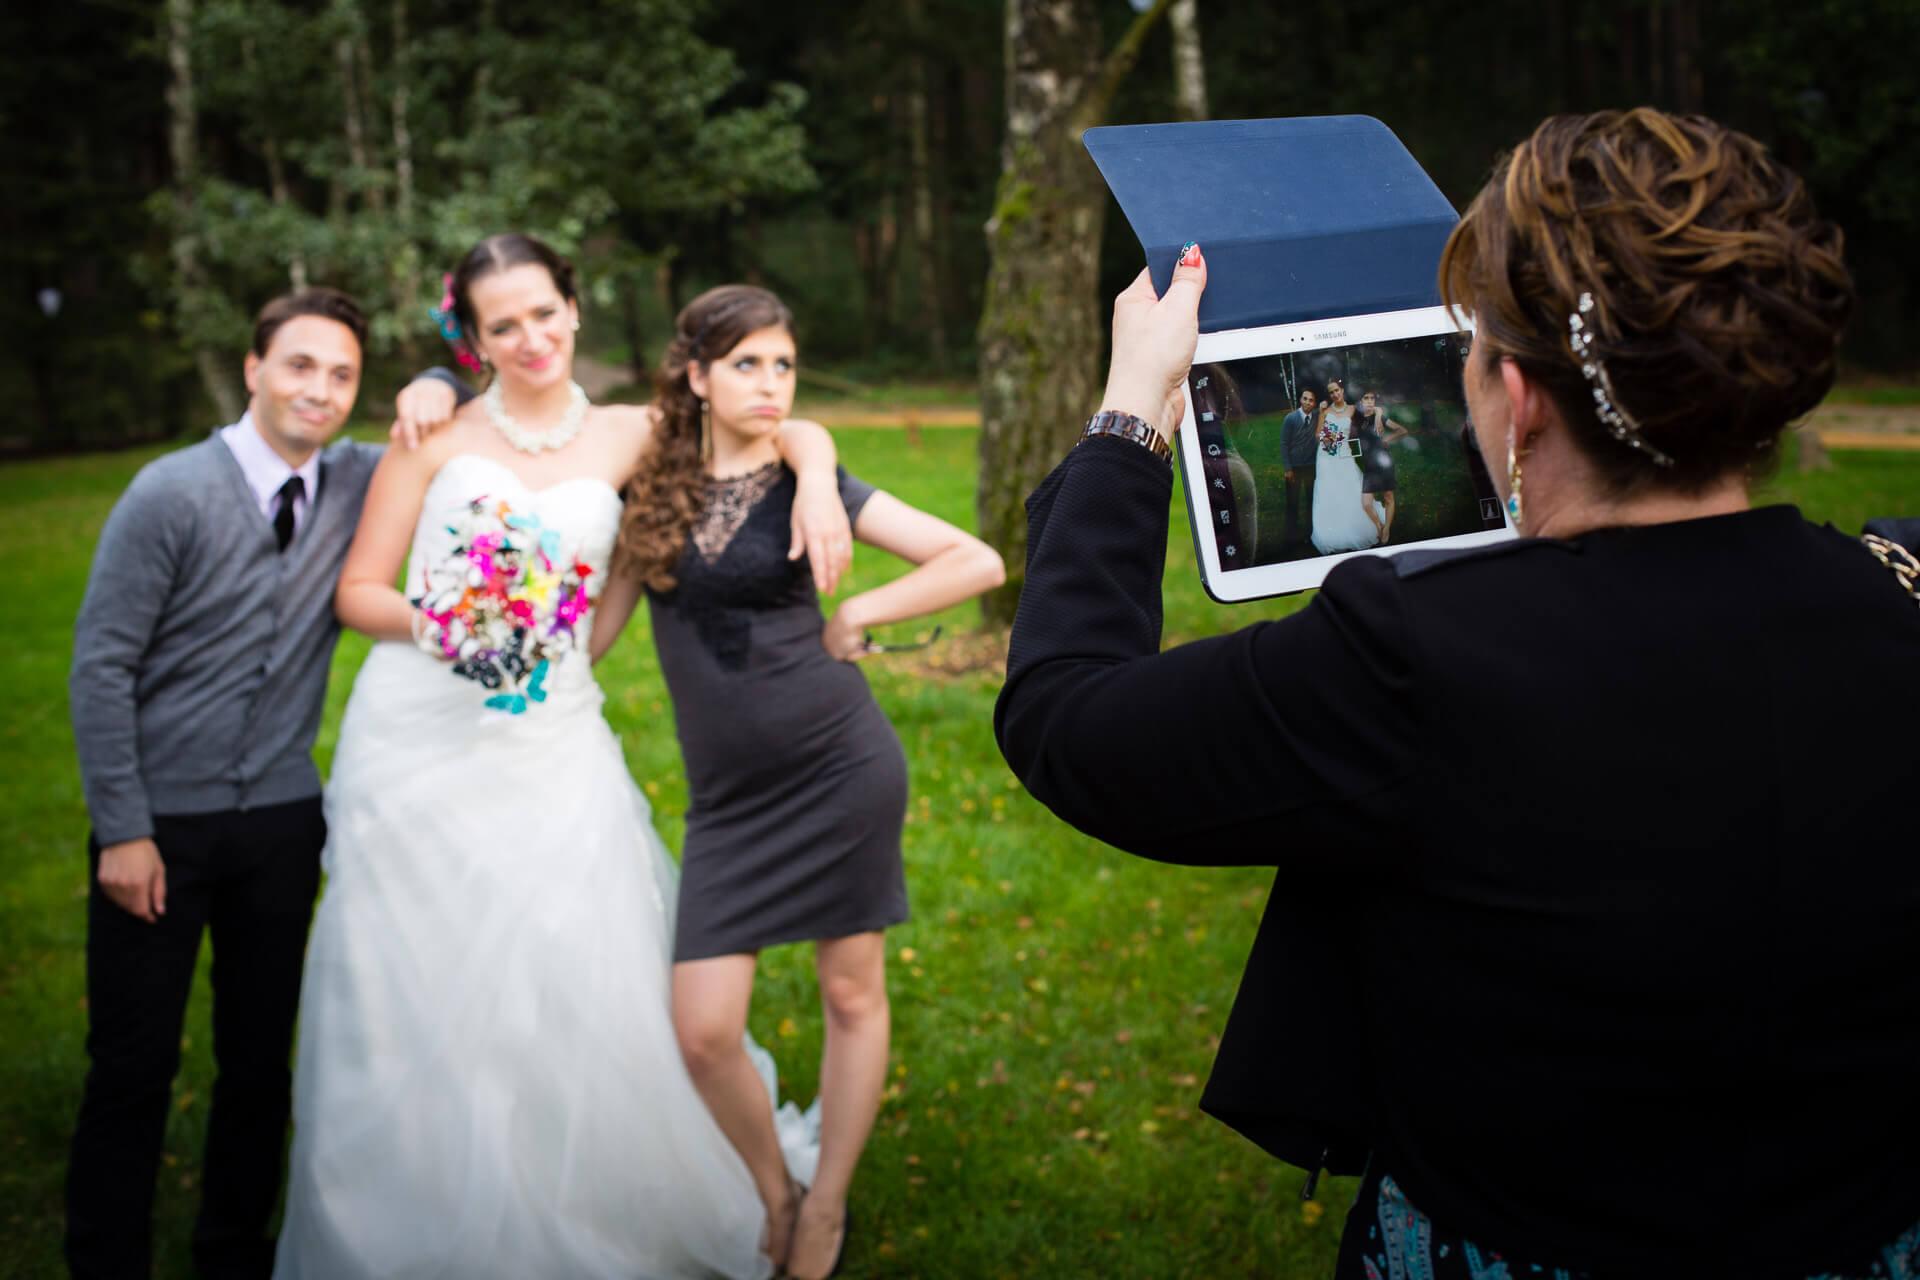 Photographe mariage au milieu nature-22